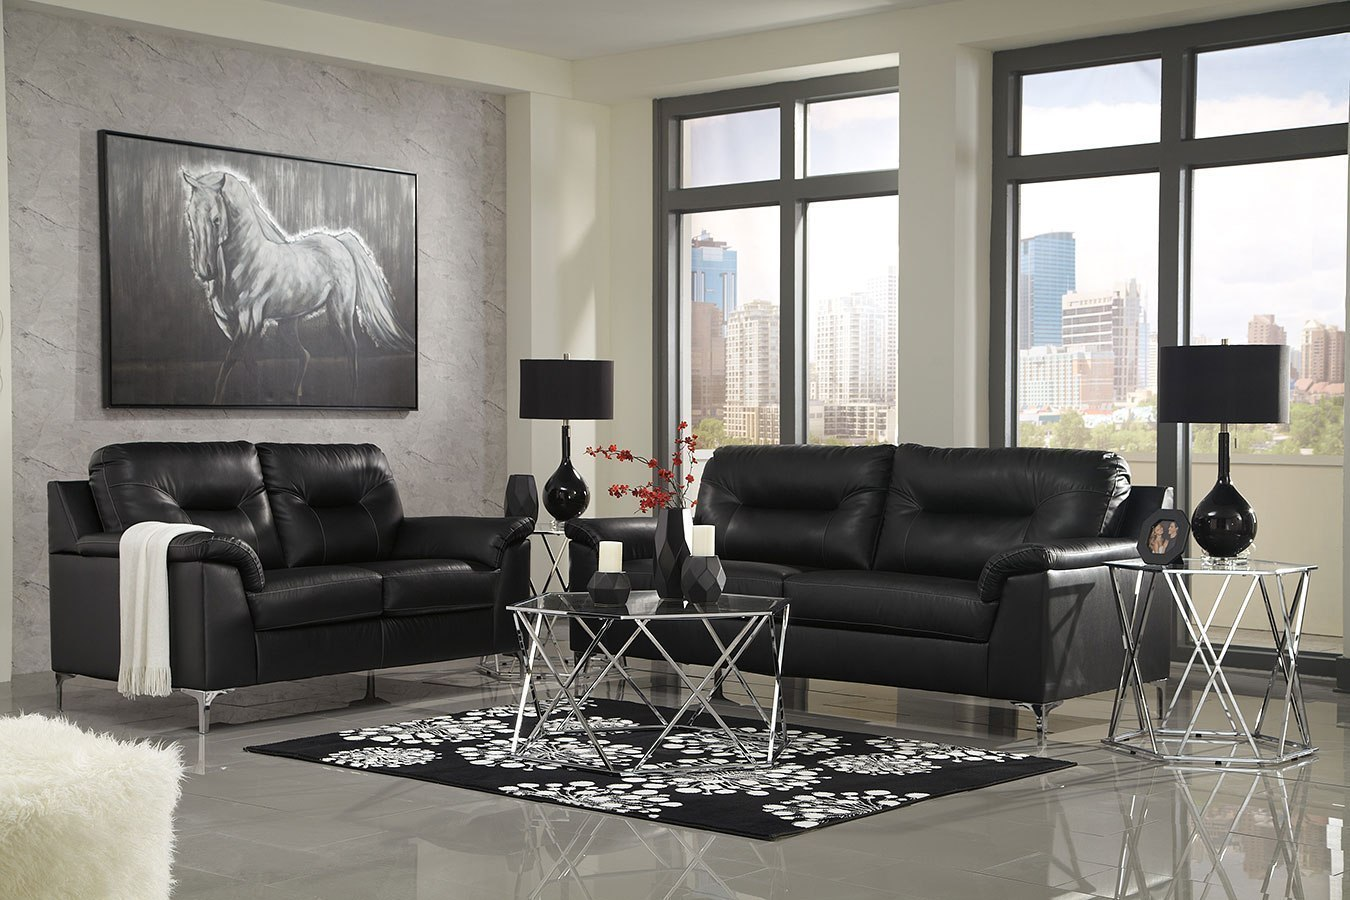 Tensas Black Living Room Set By Signature Design By Ashley